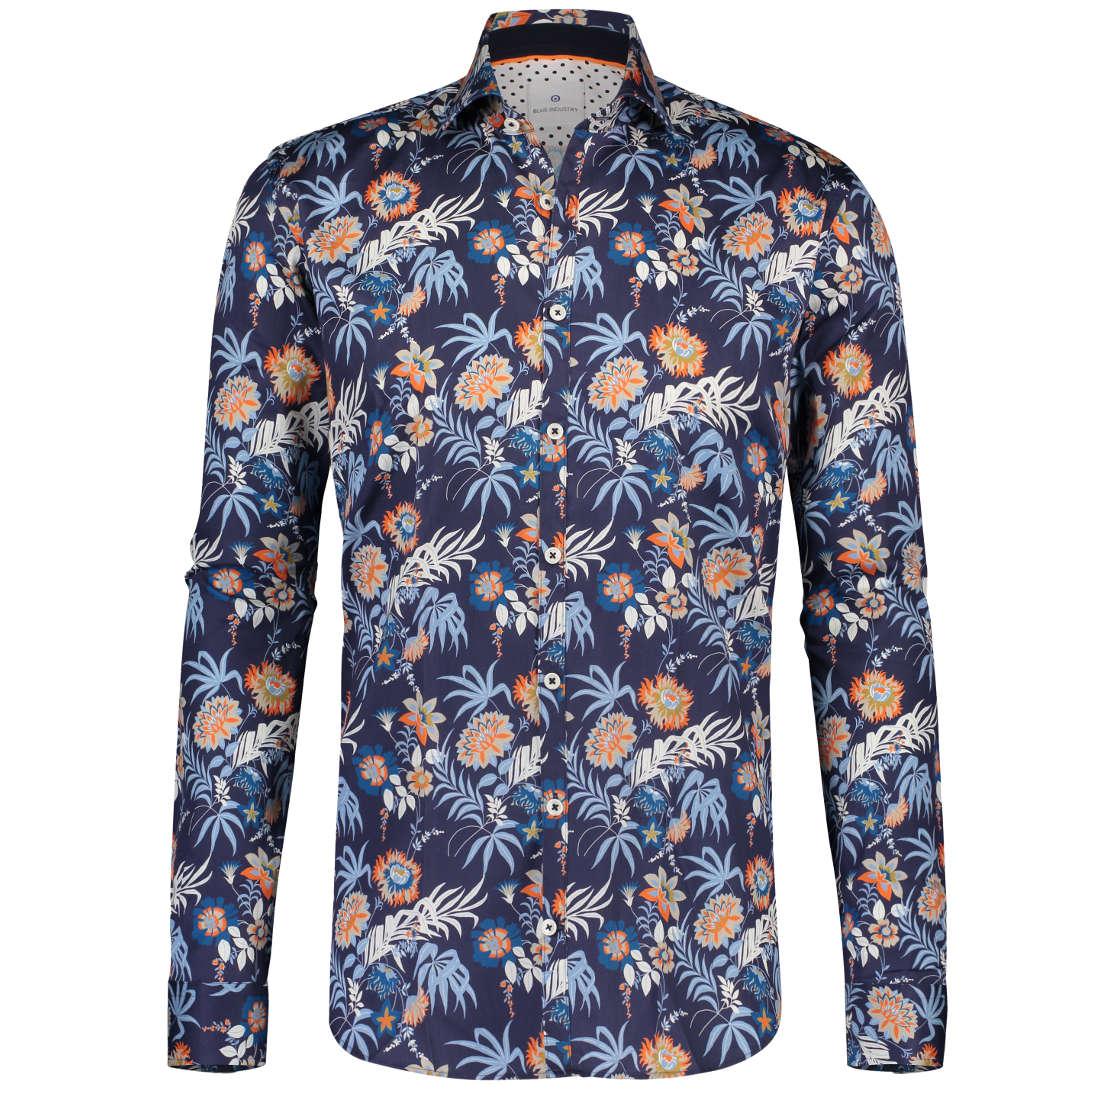 Blue Industry overhemd 1220-91 in het Oranje